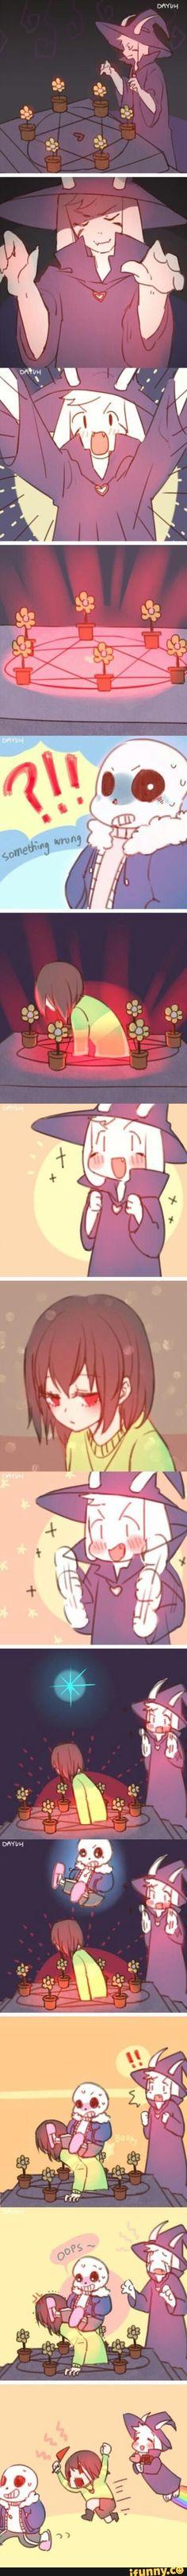 Asriel's doing a satanic ritual...  Credit to artist